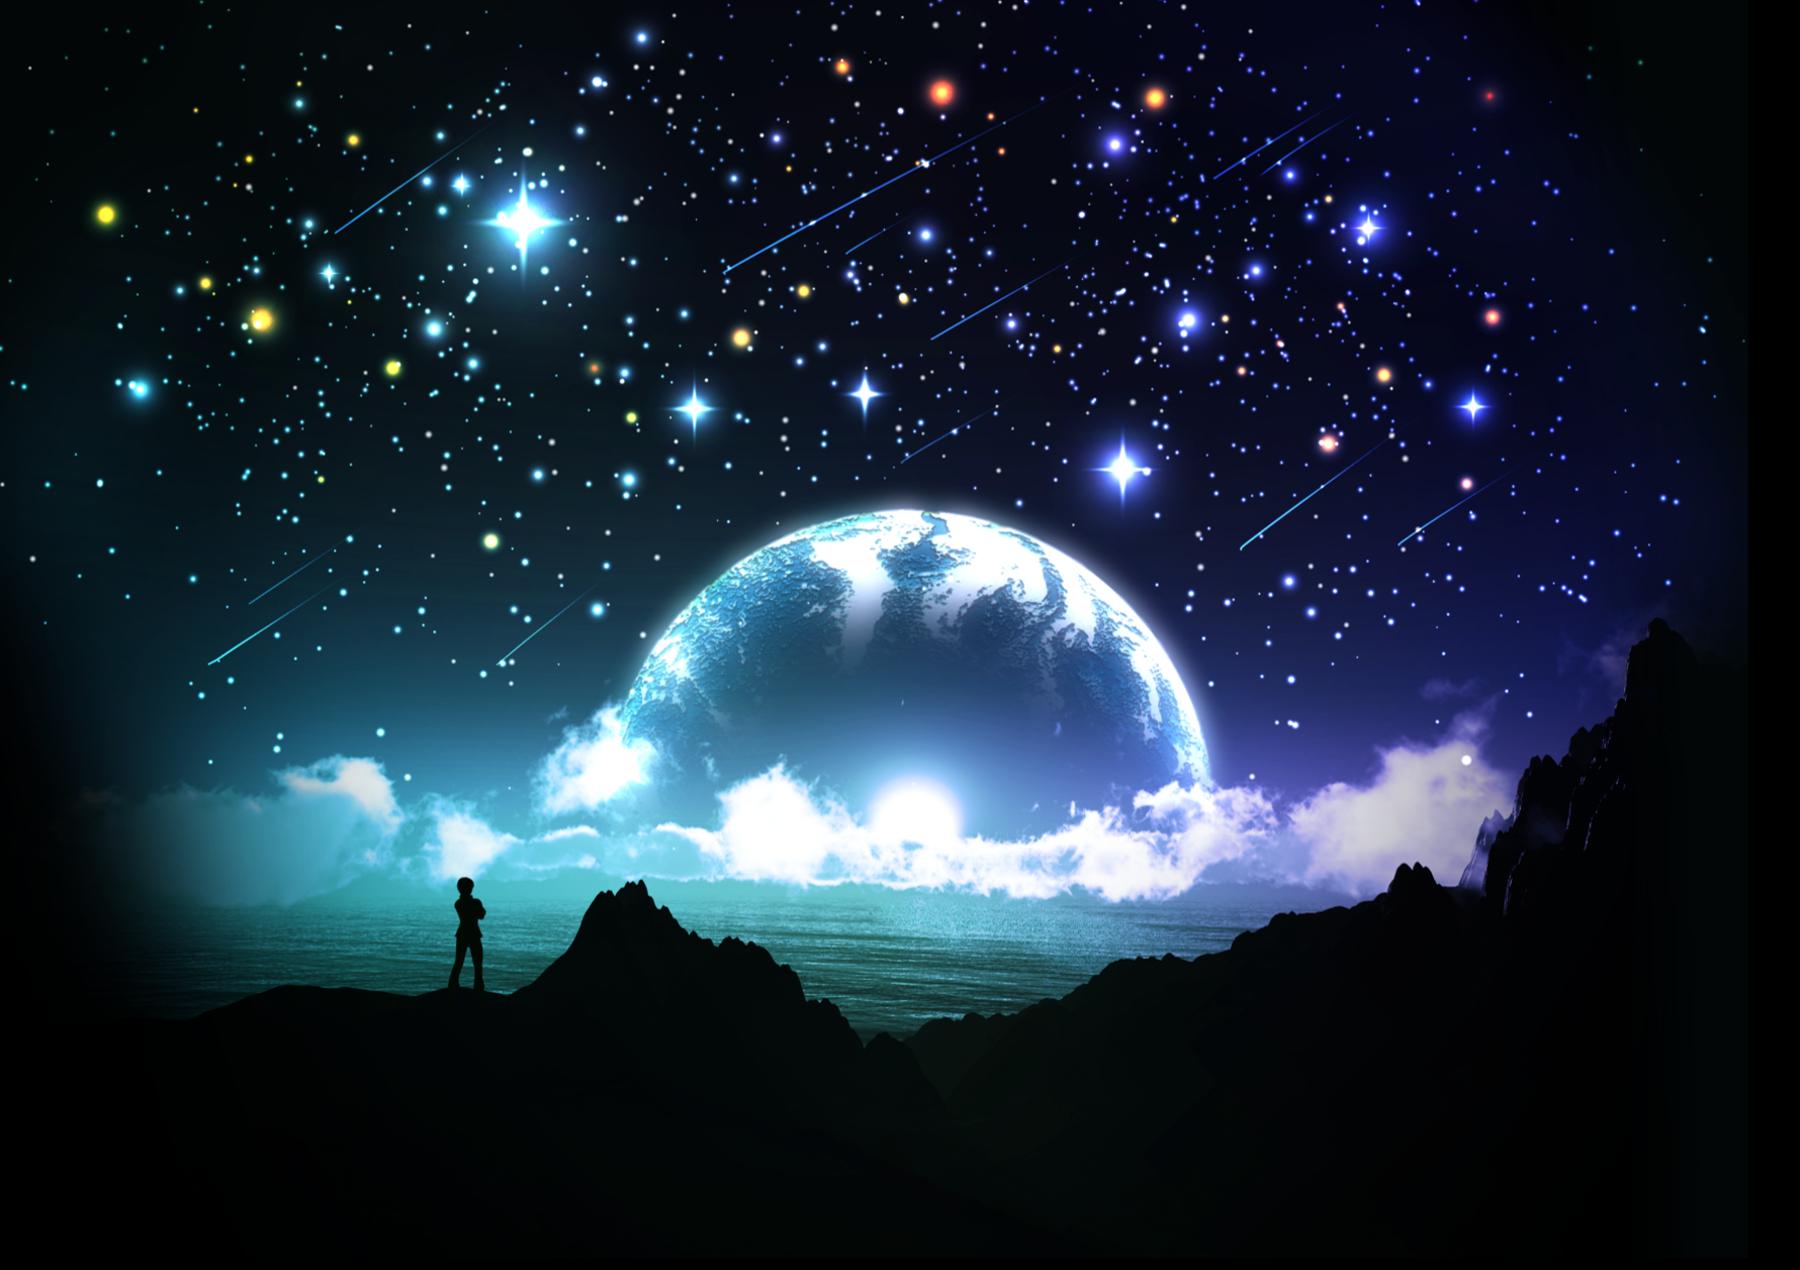 Anime - Original Fantasy Planet Boy Stars Night Blue Water Ocean Wallpaper